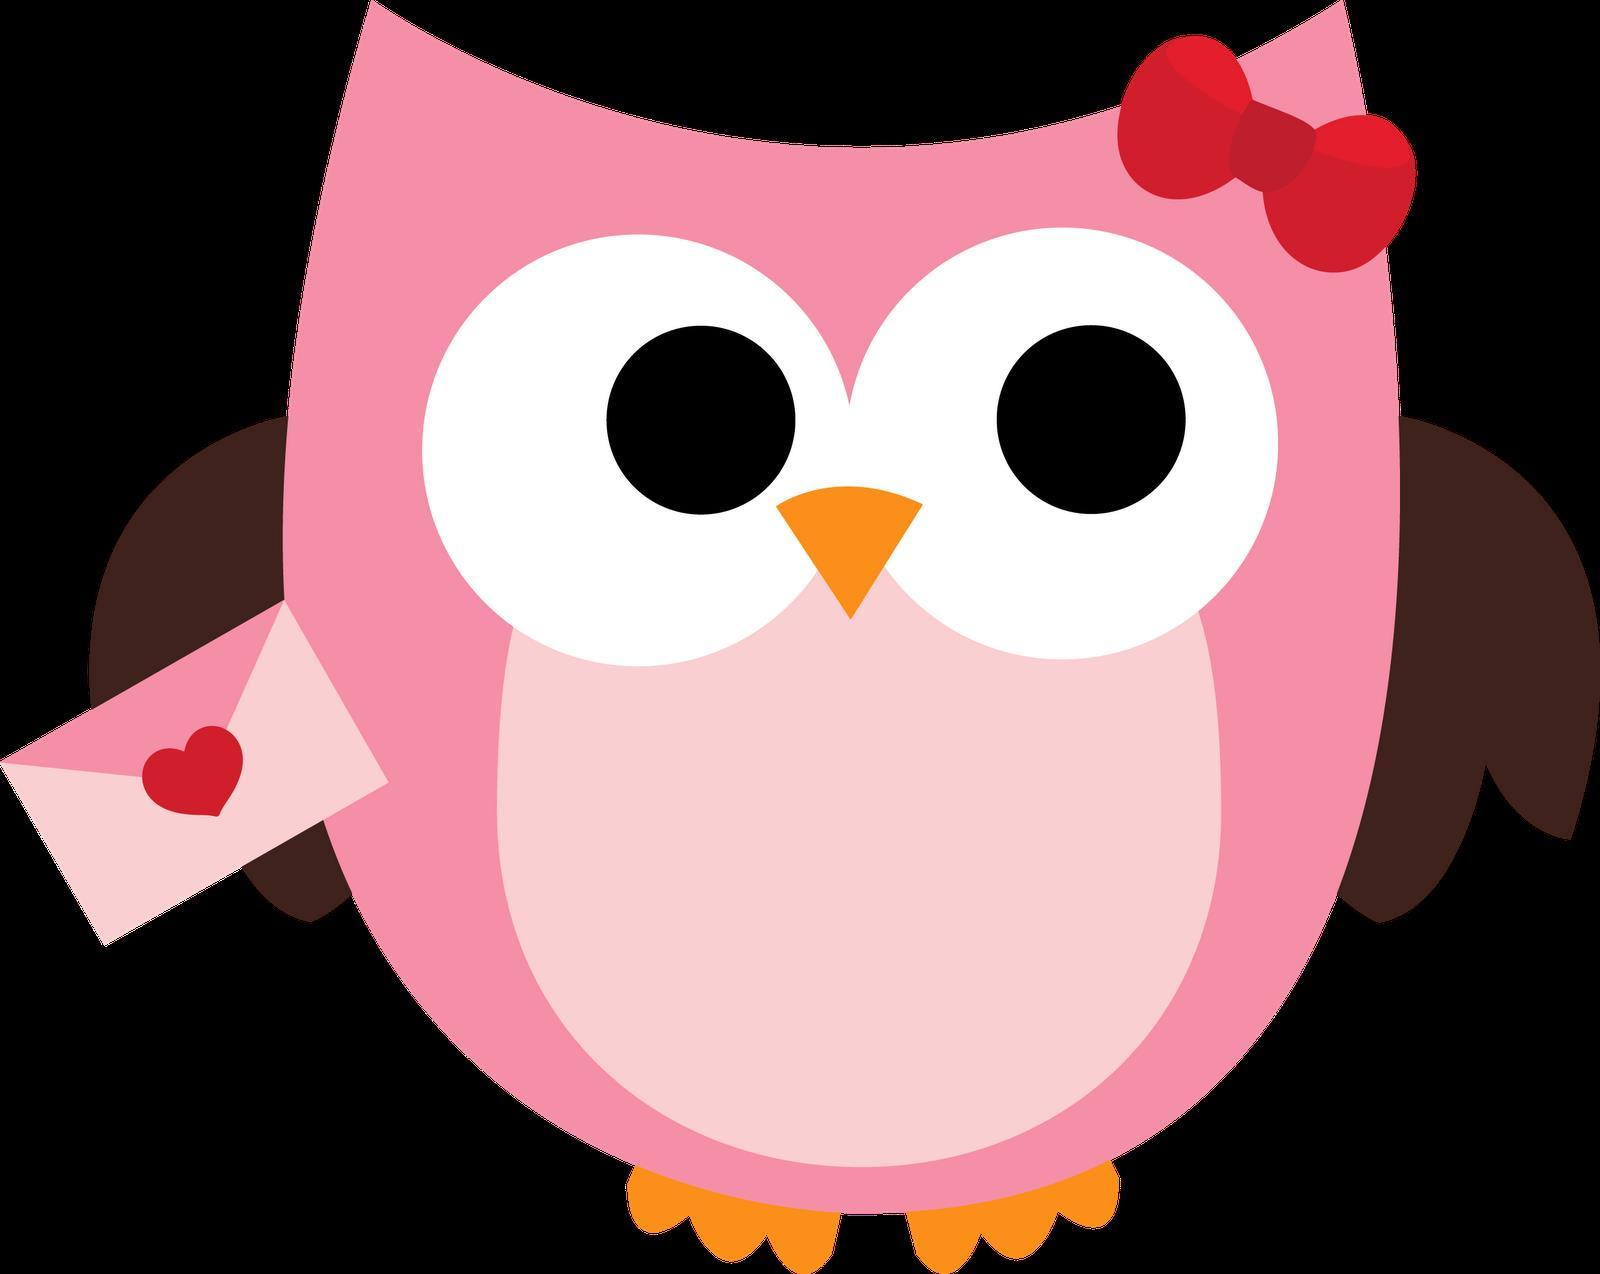 Happy Valentines Day Owl Clip Art Calamarislingshot Site